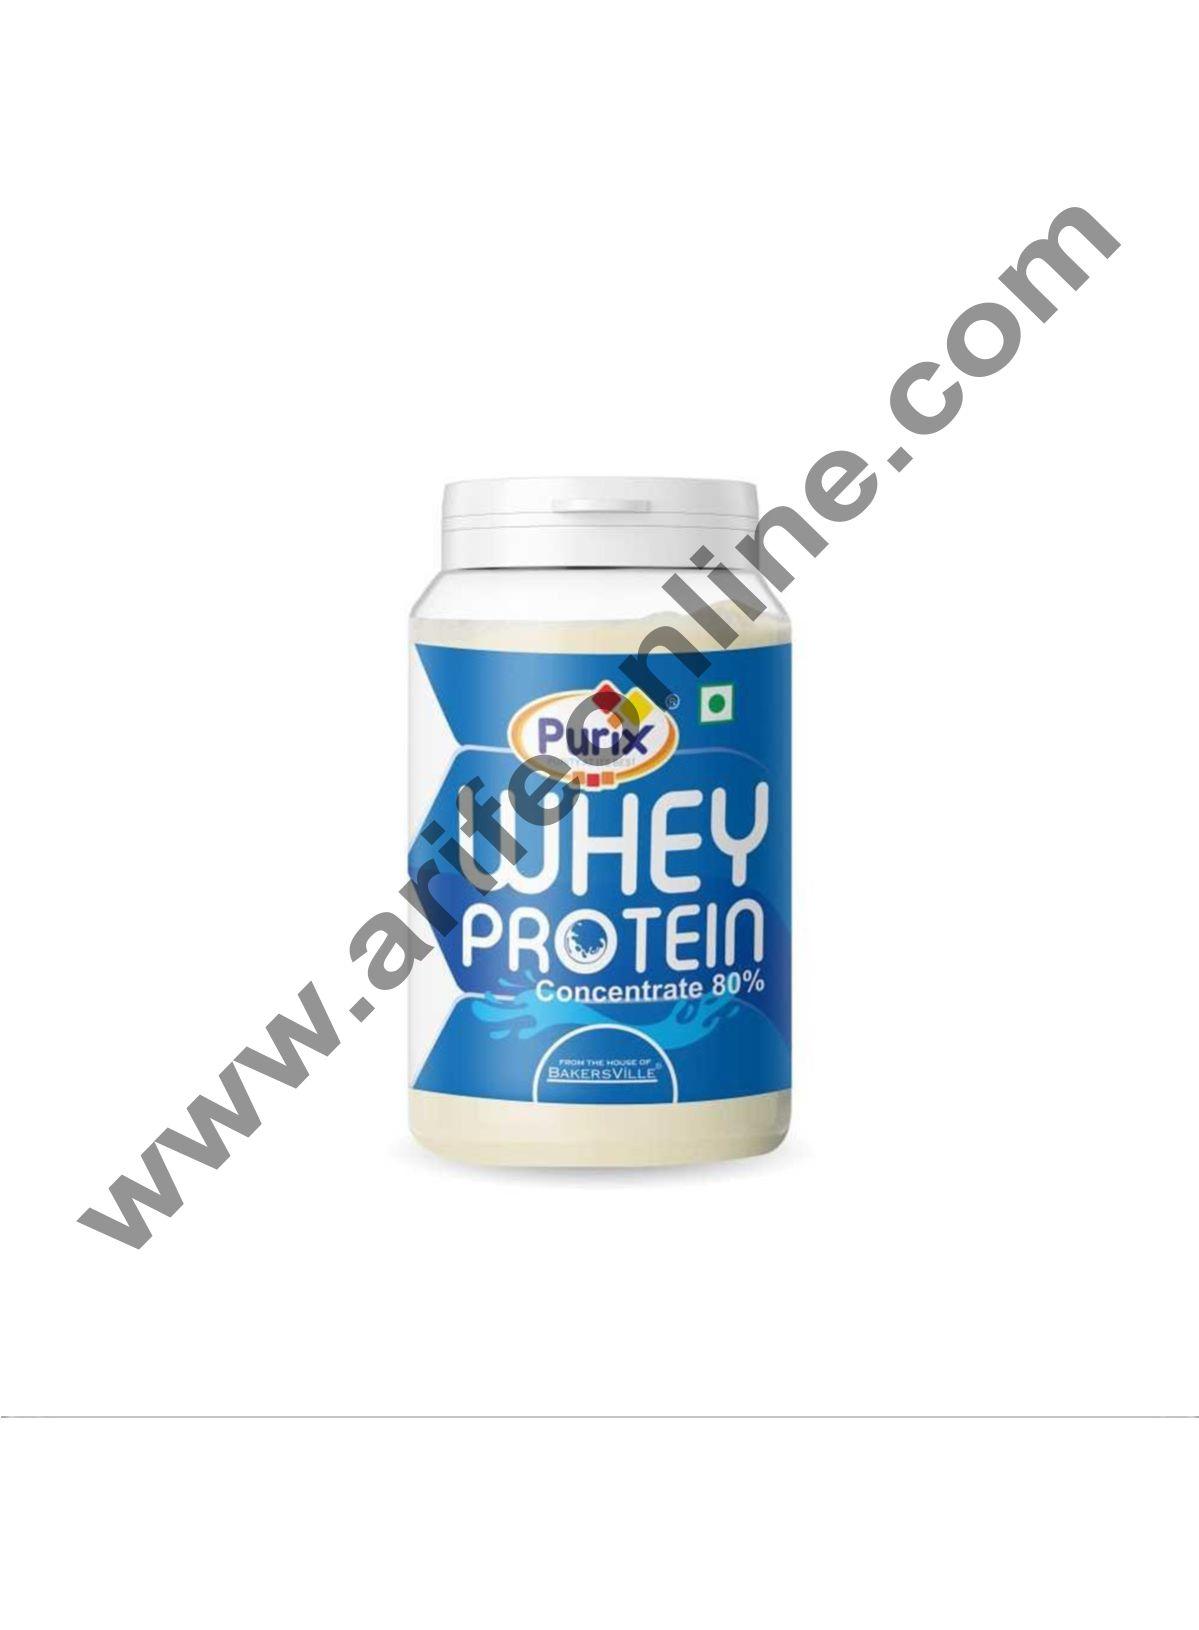 Purix® Whey Protein, 75gm